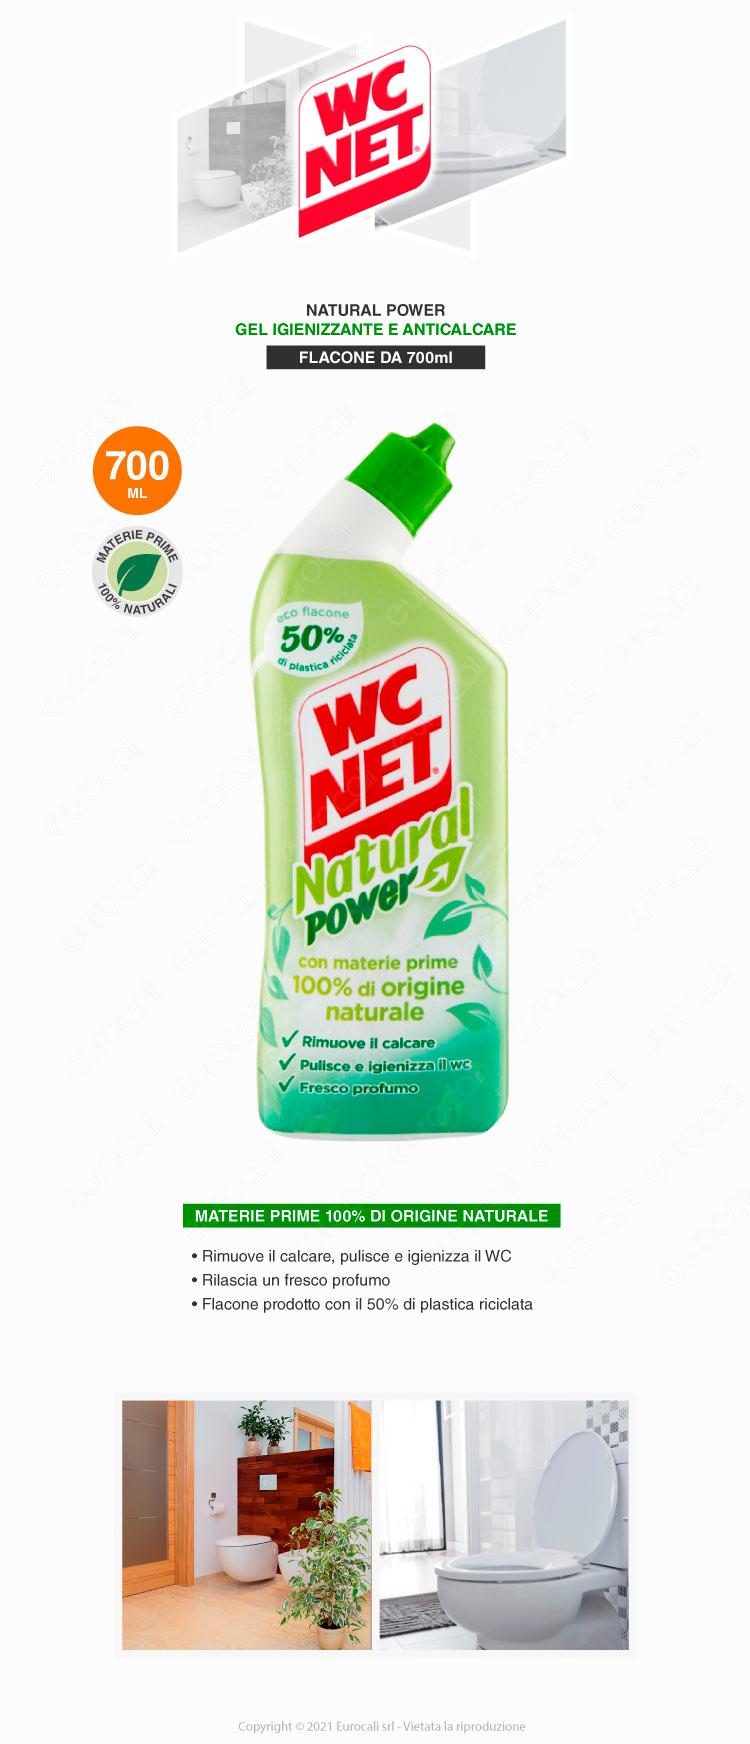 wc net natural power